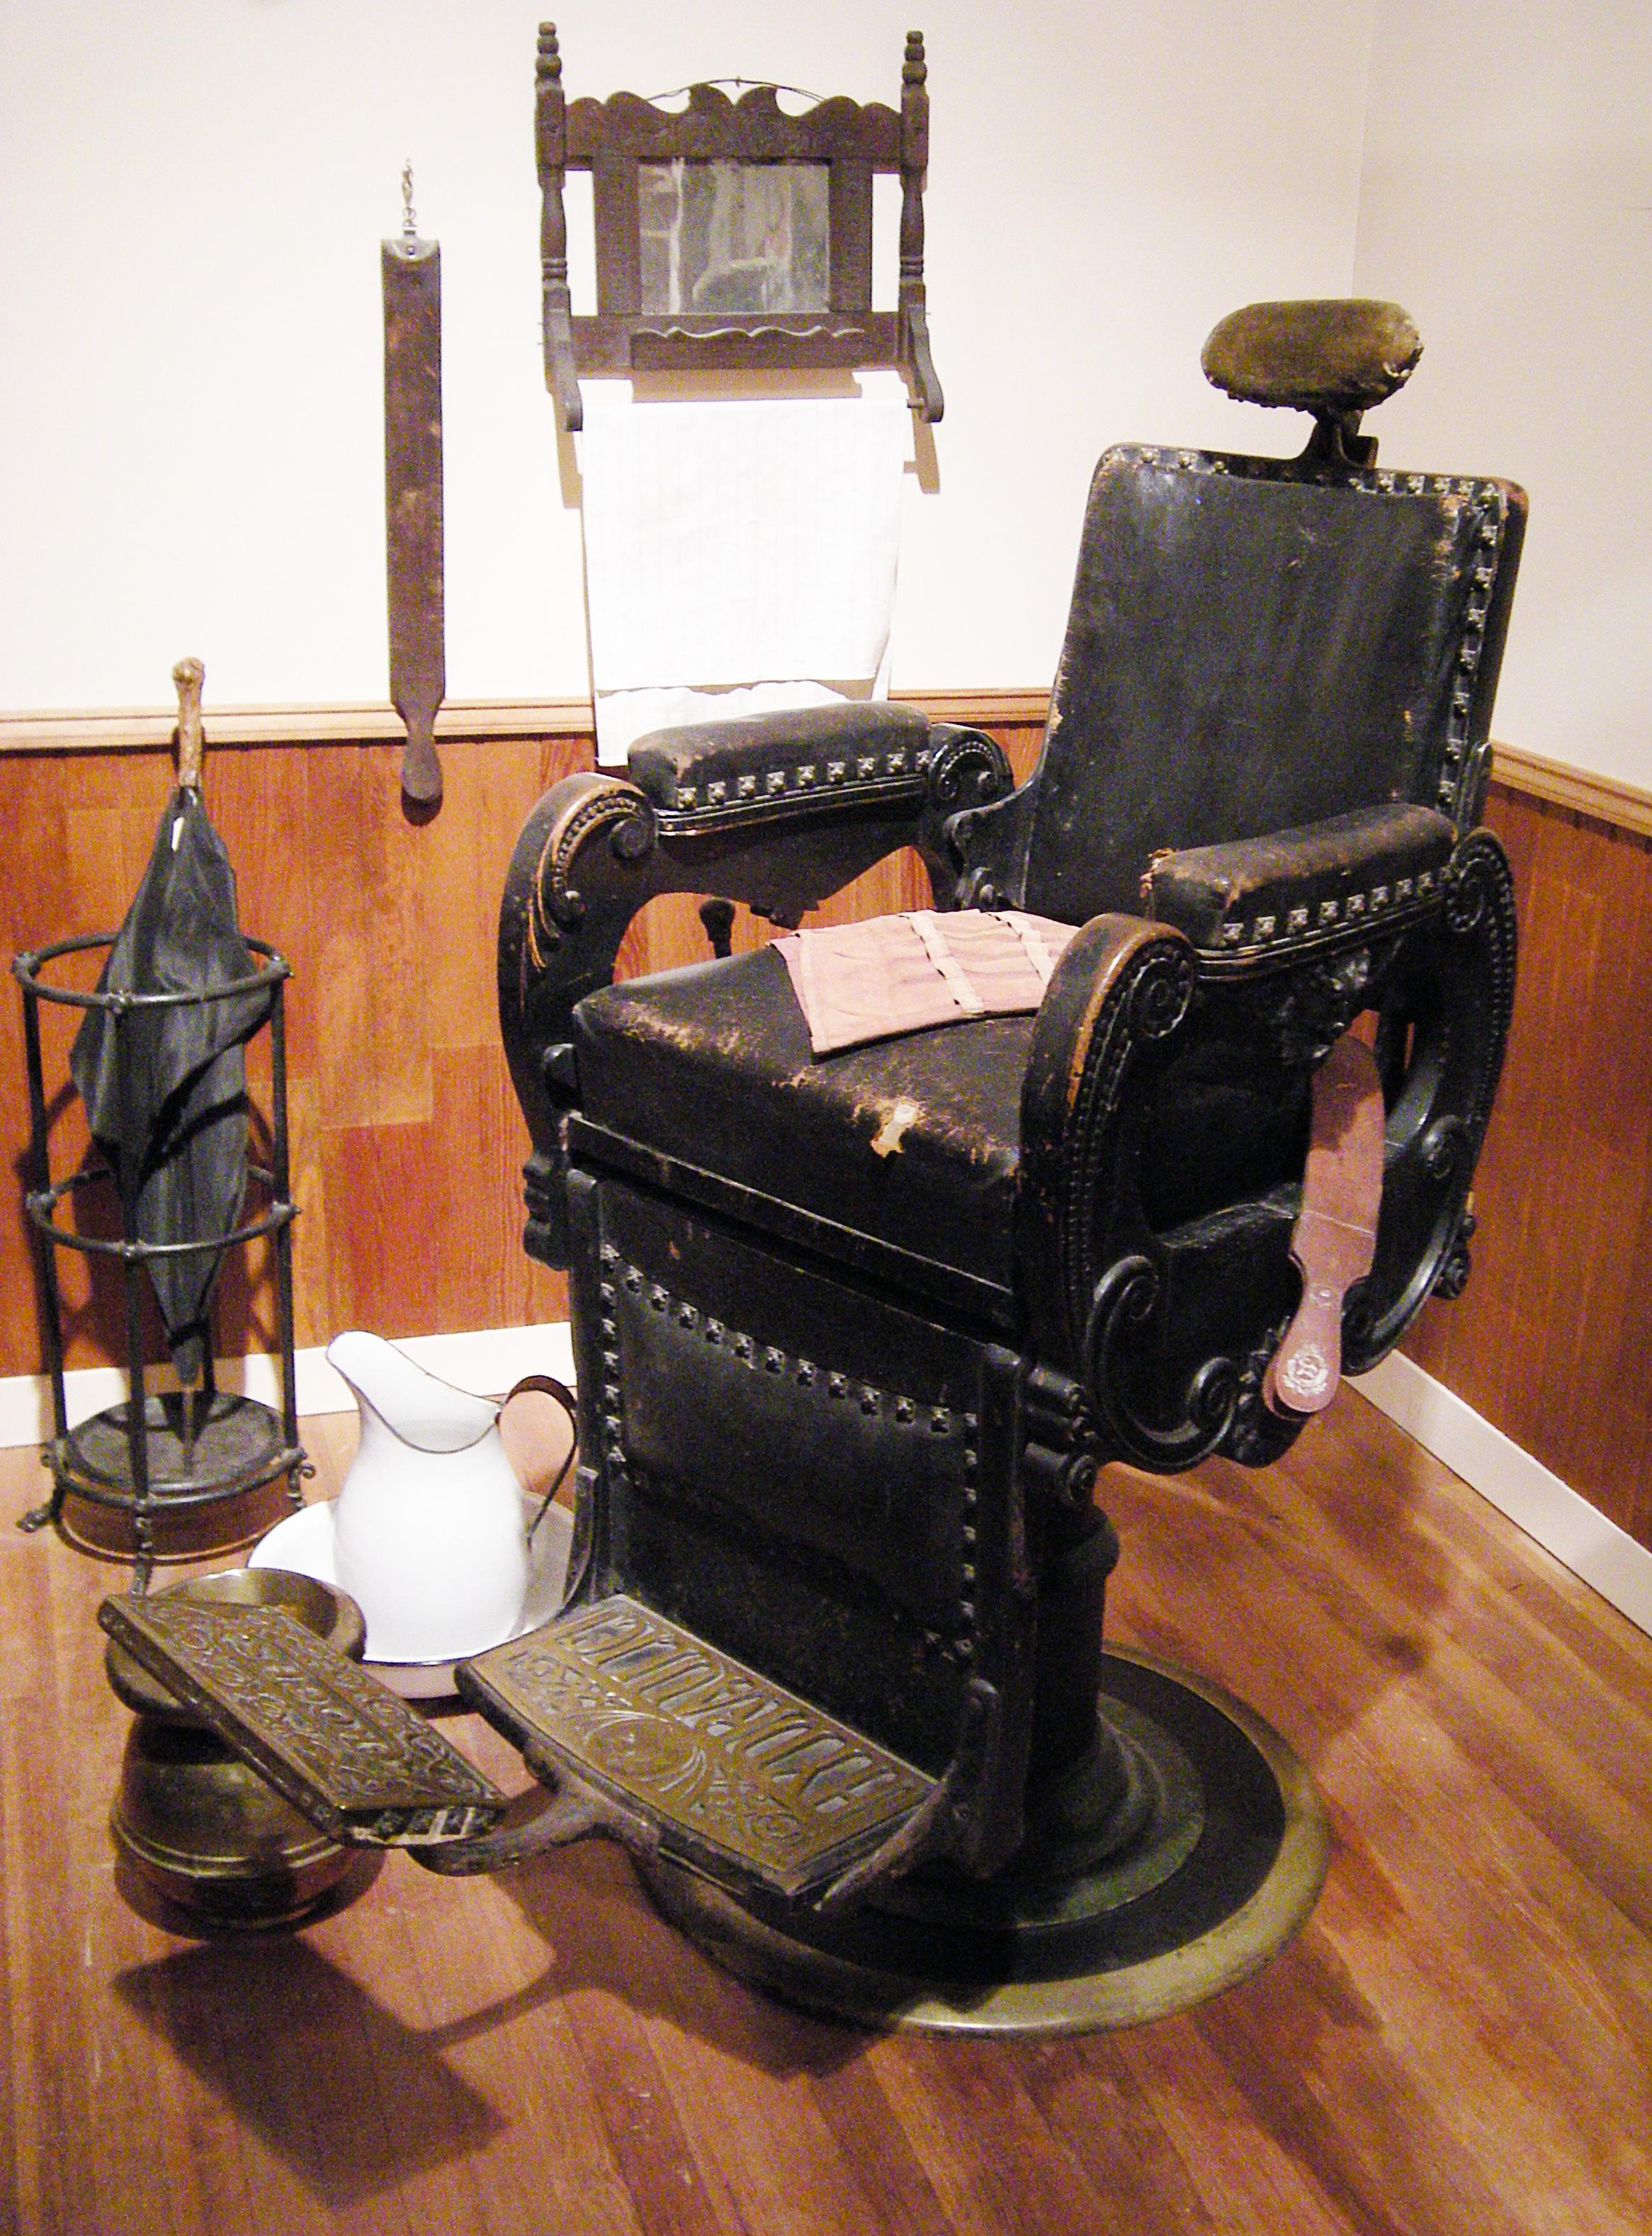 Barber Industry : File:MOHAI - J. N. Hoopers Barber Shop - A.jpg - Wikipedia, the free ...